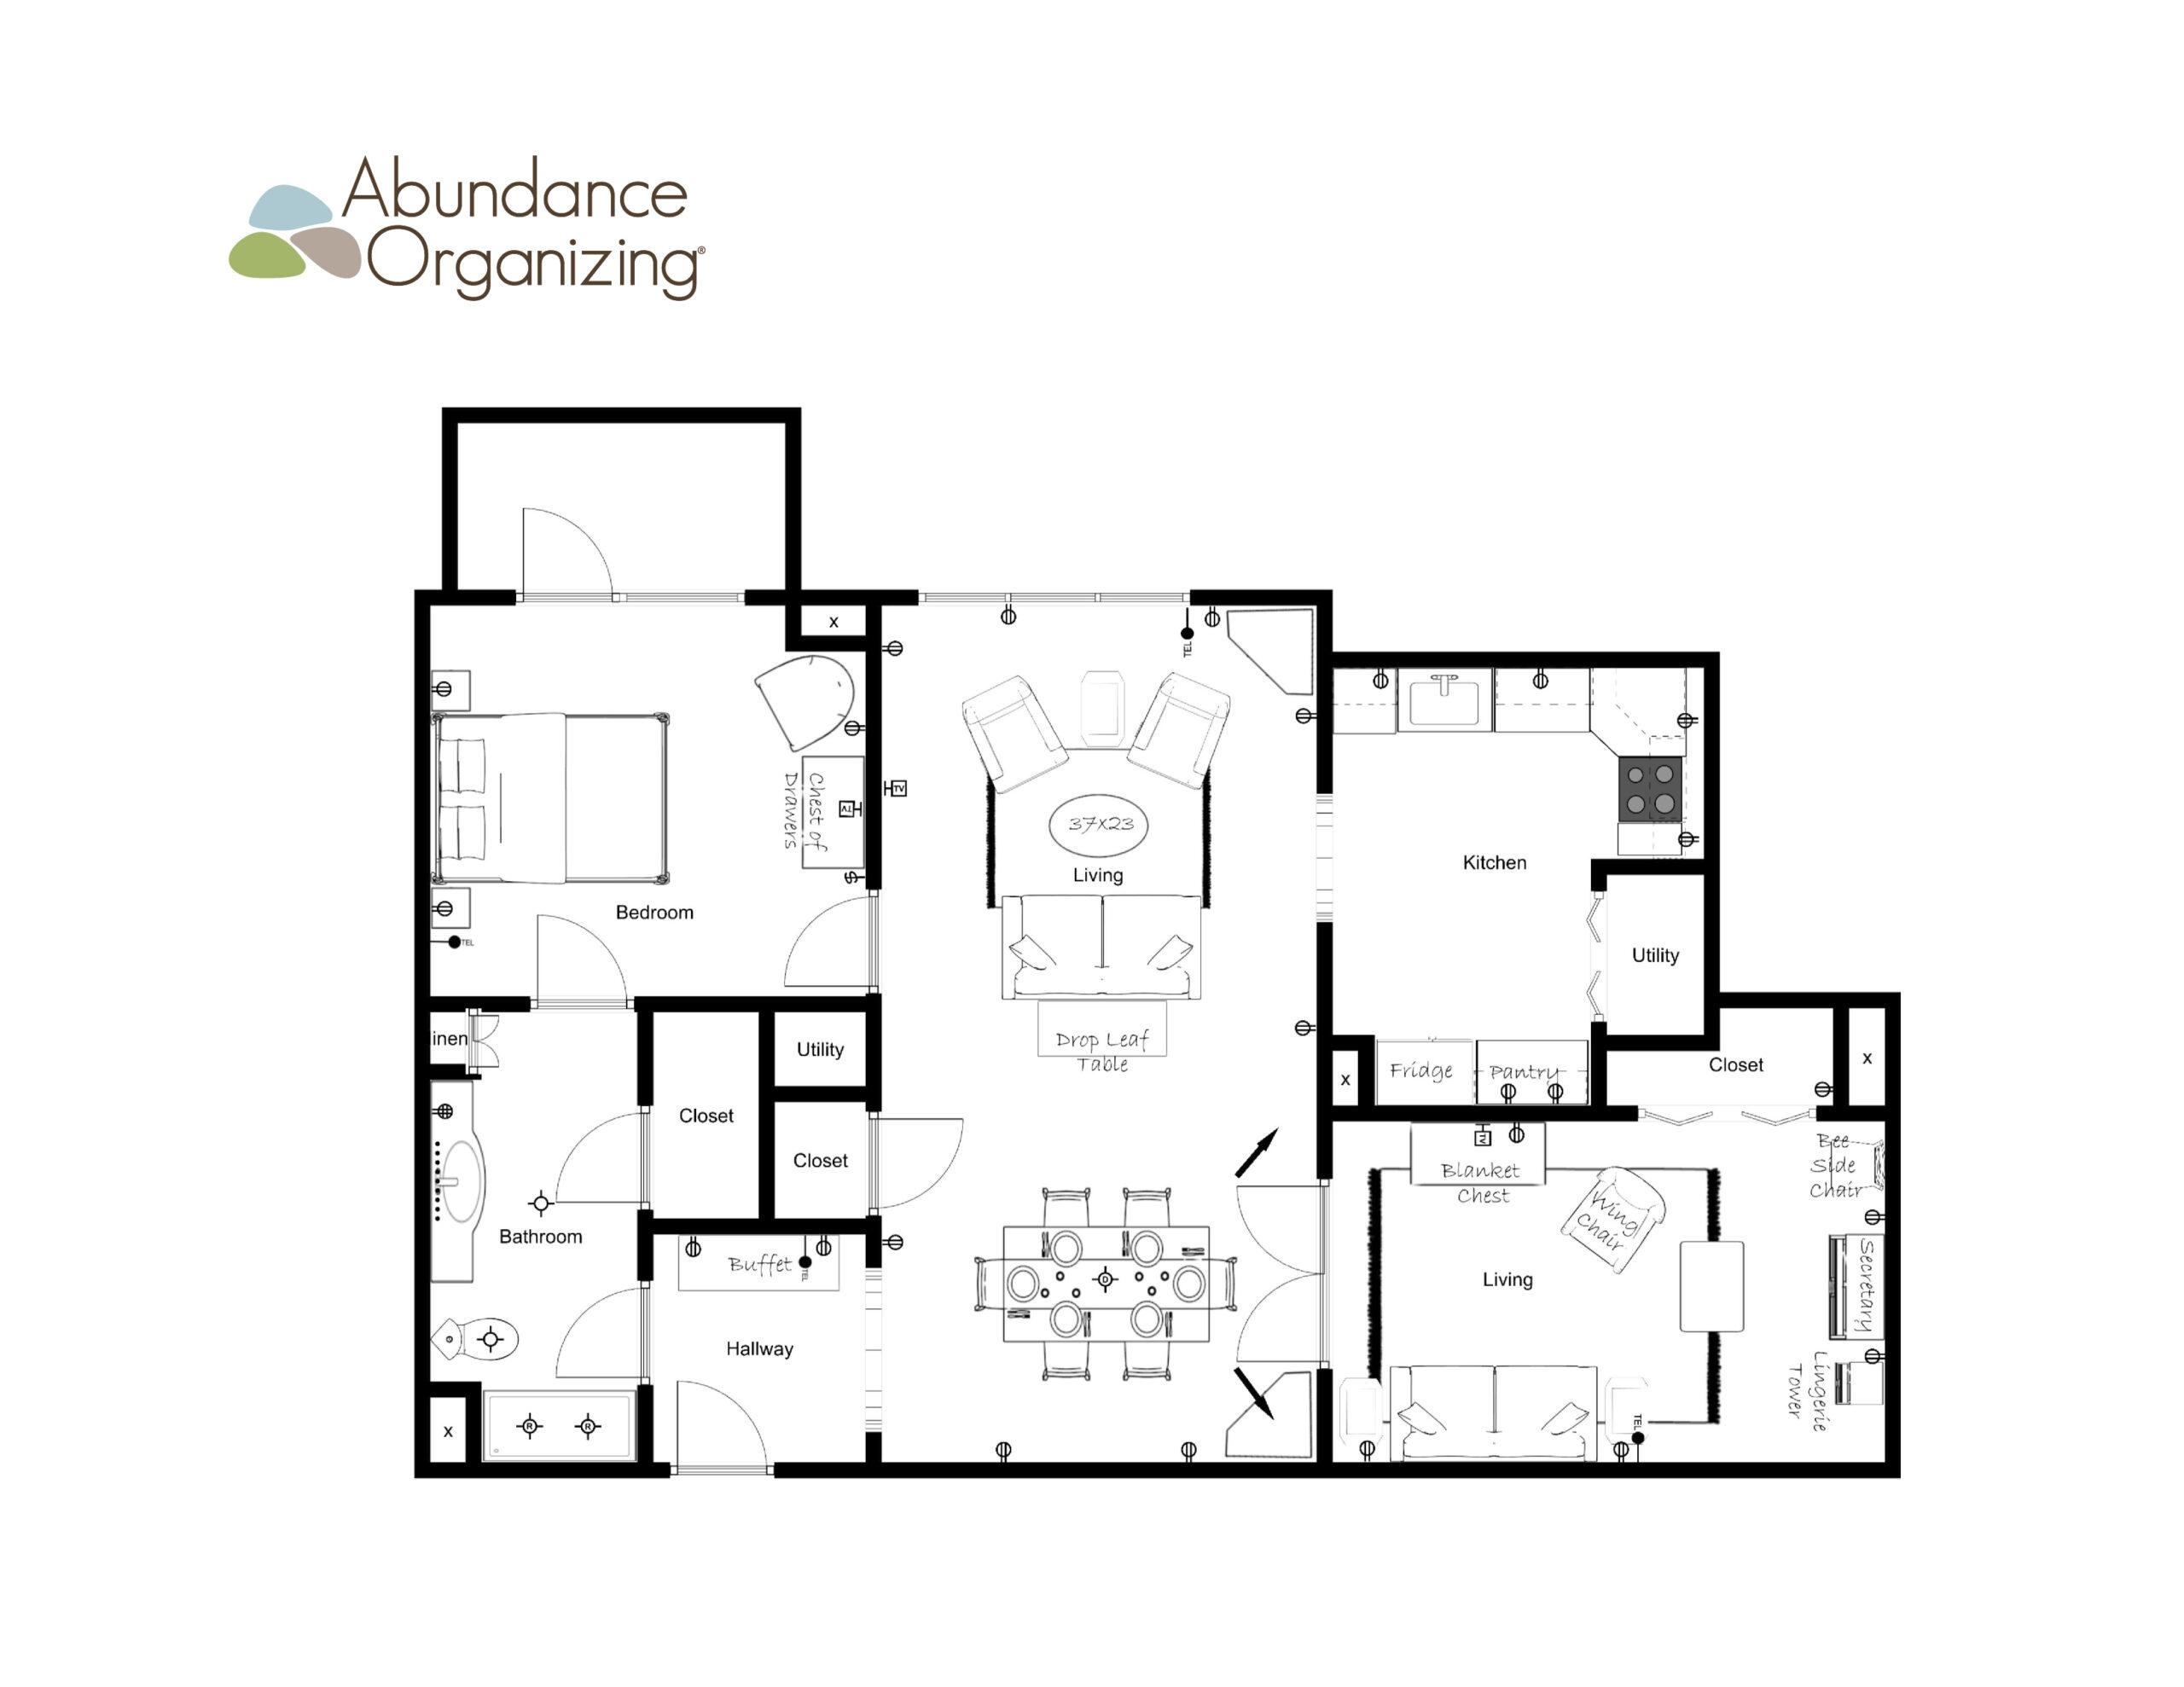 Sample of a floor plan by Abundance Organizing